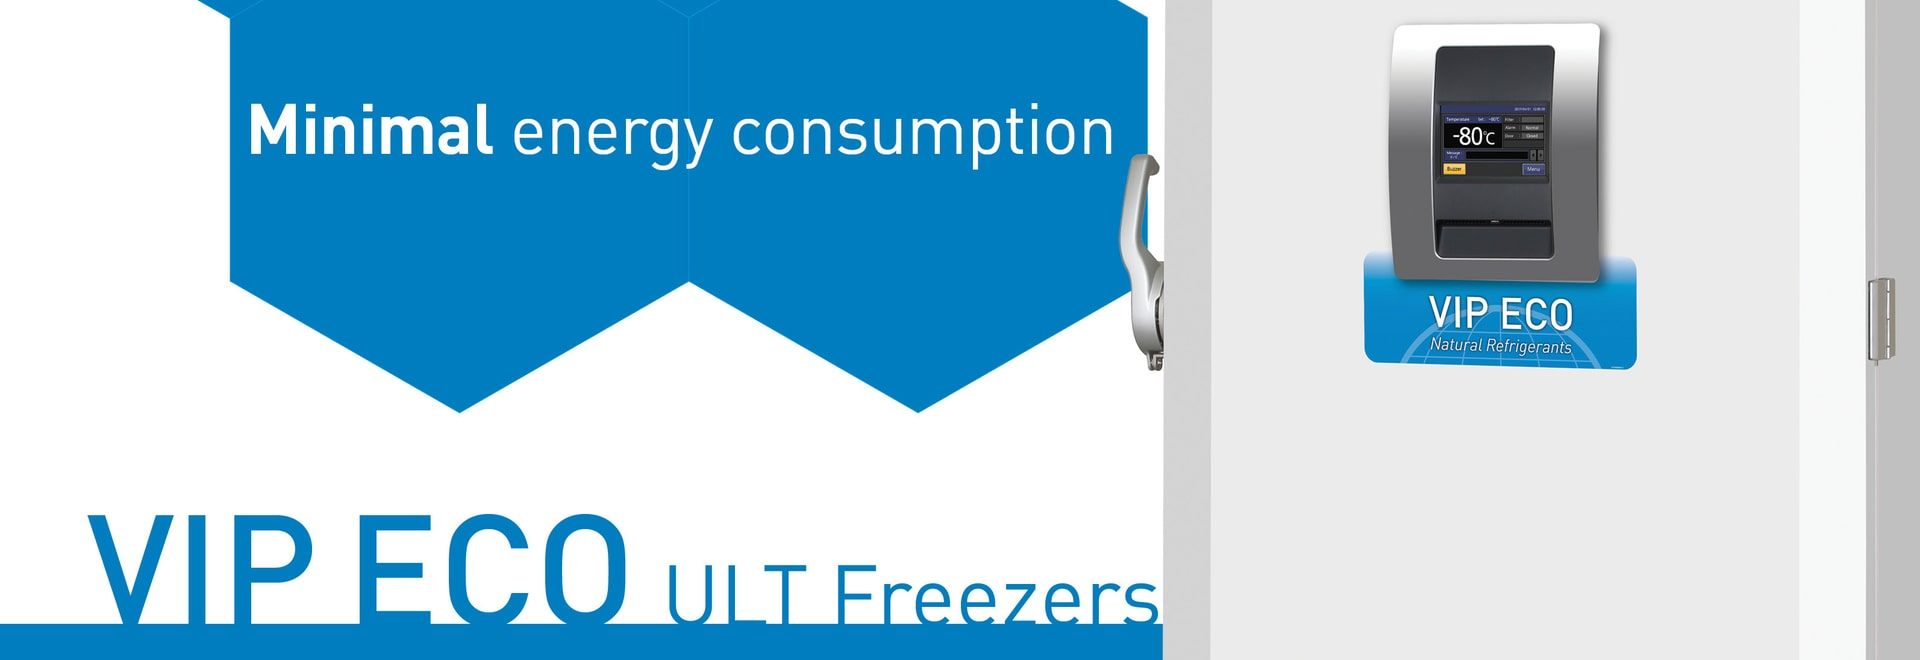 I love minimal energy consumption